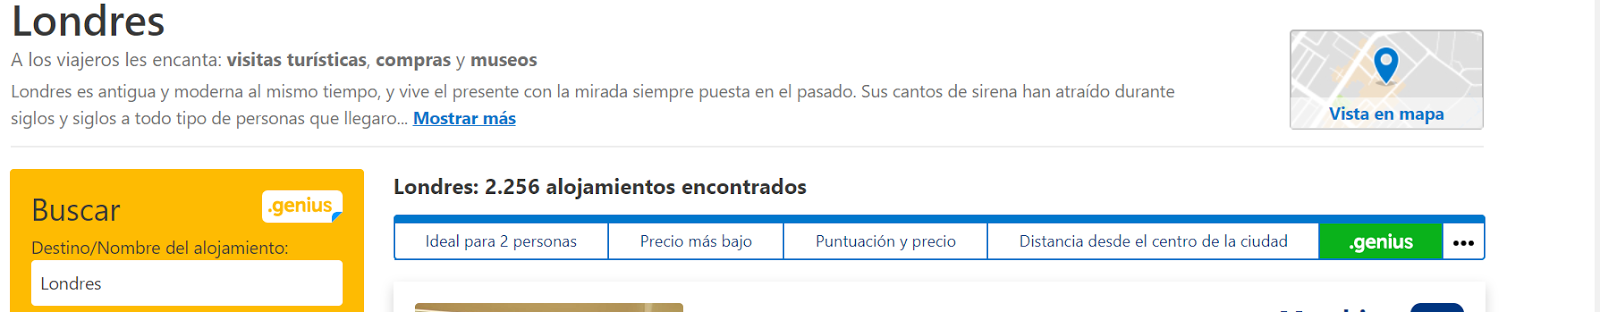 ver_mapa_booking_cabecera